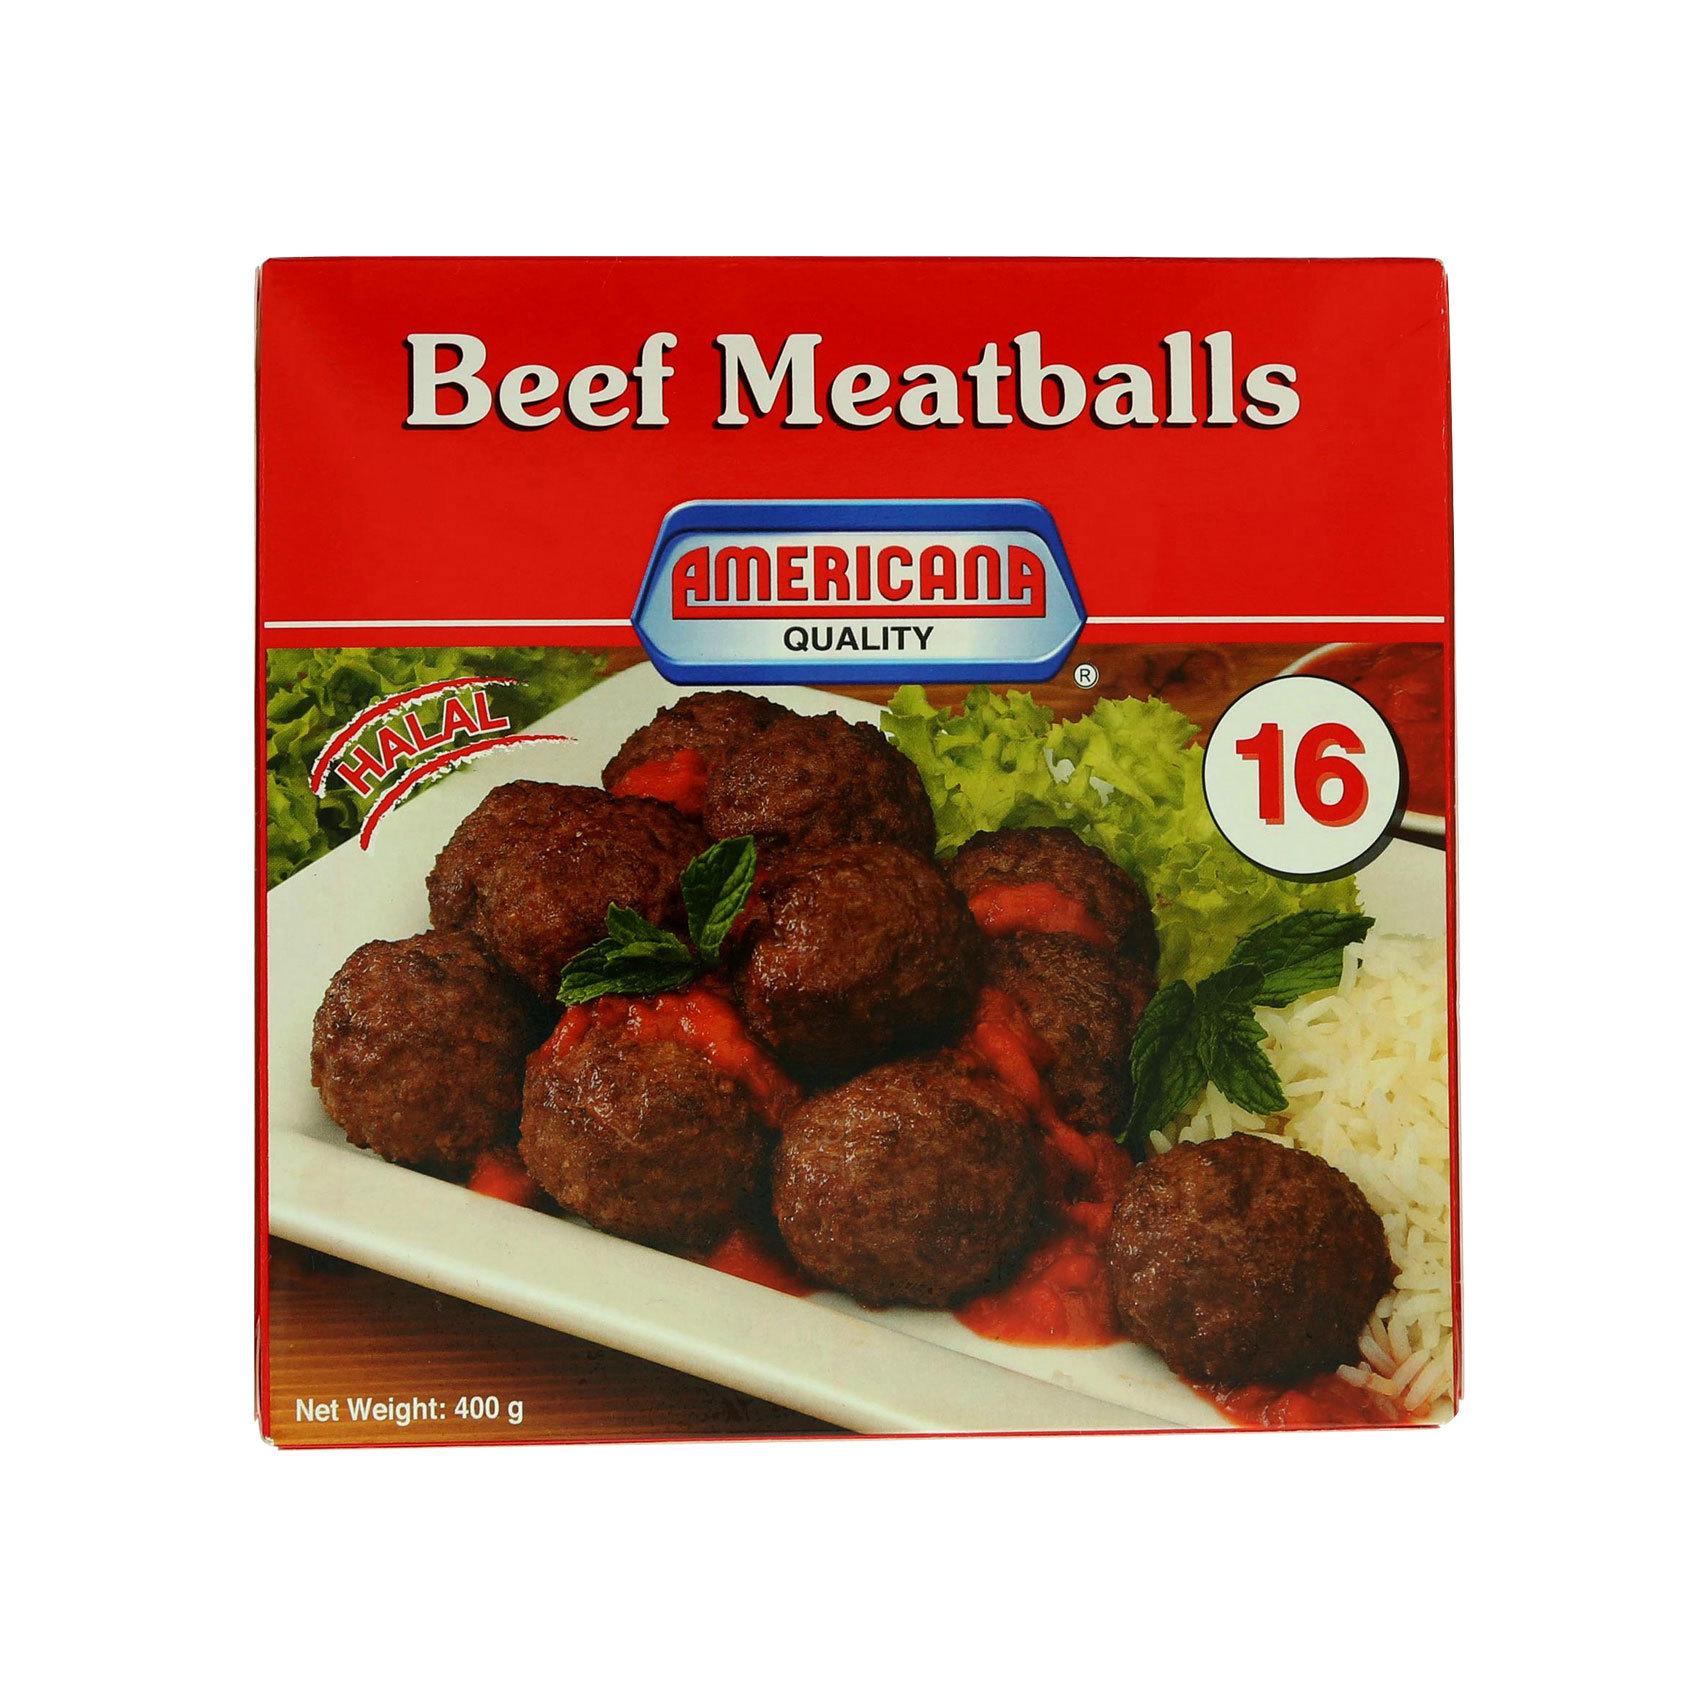 AMERICANA MEATBALLS BEEF 400G